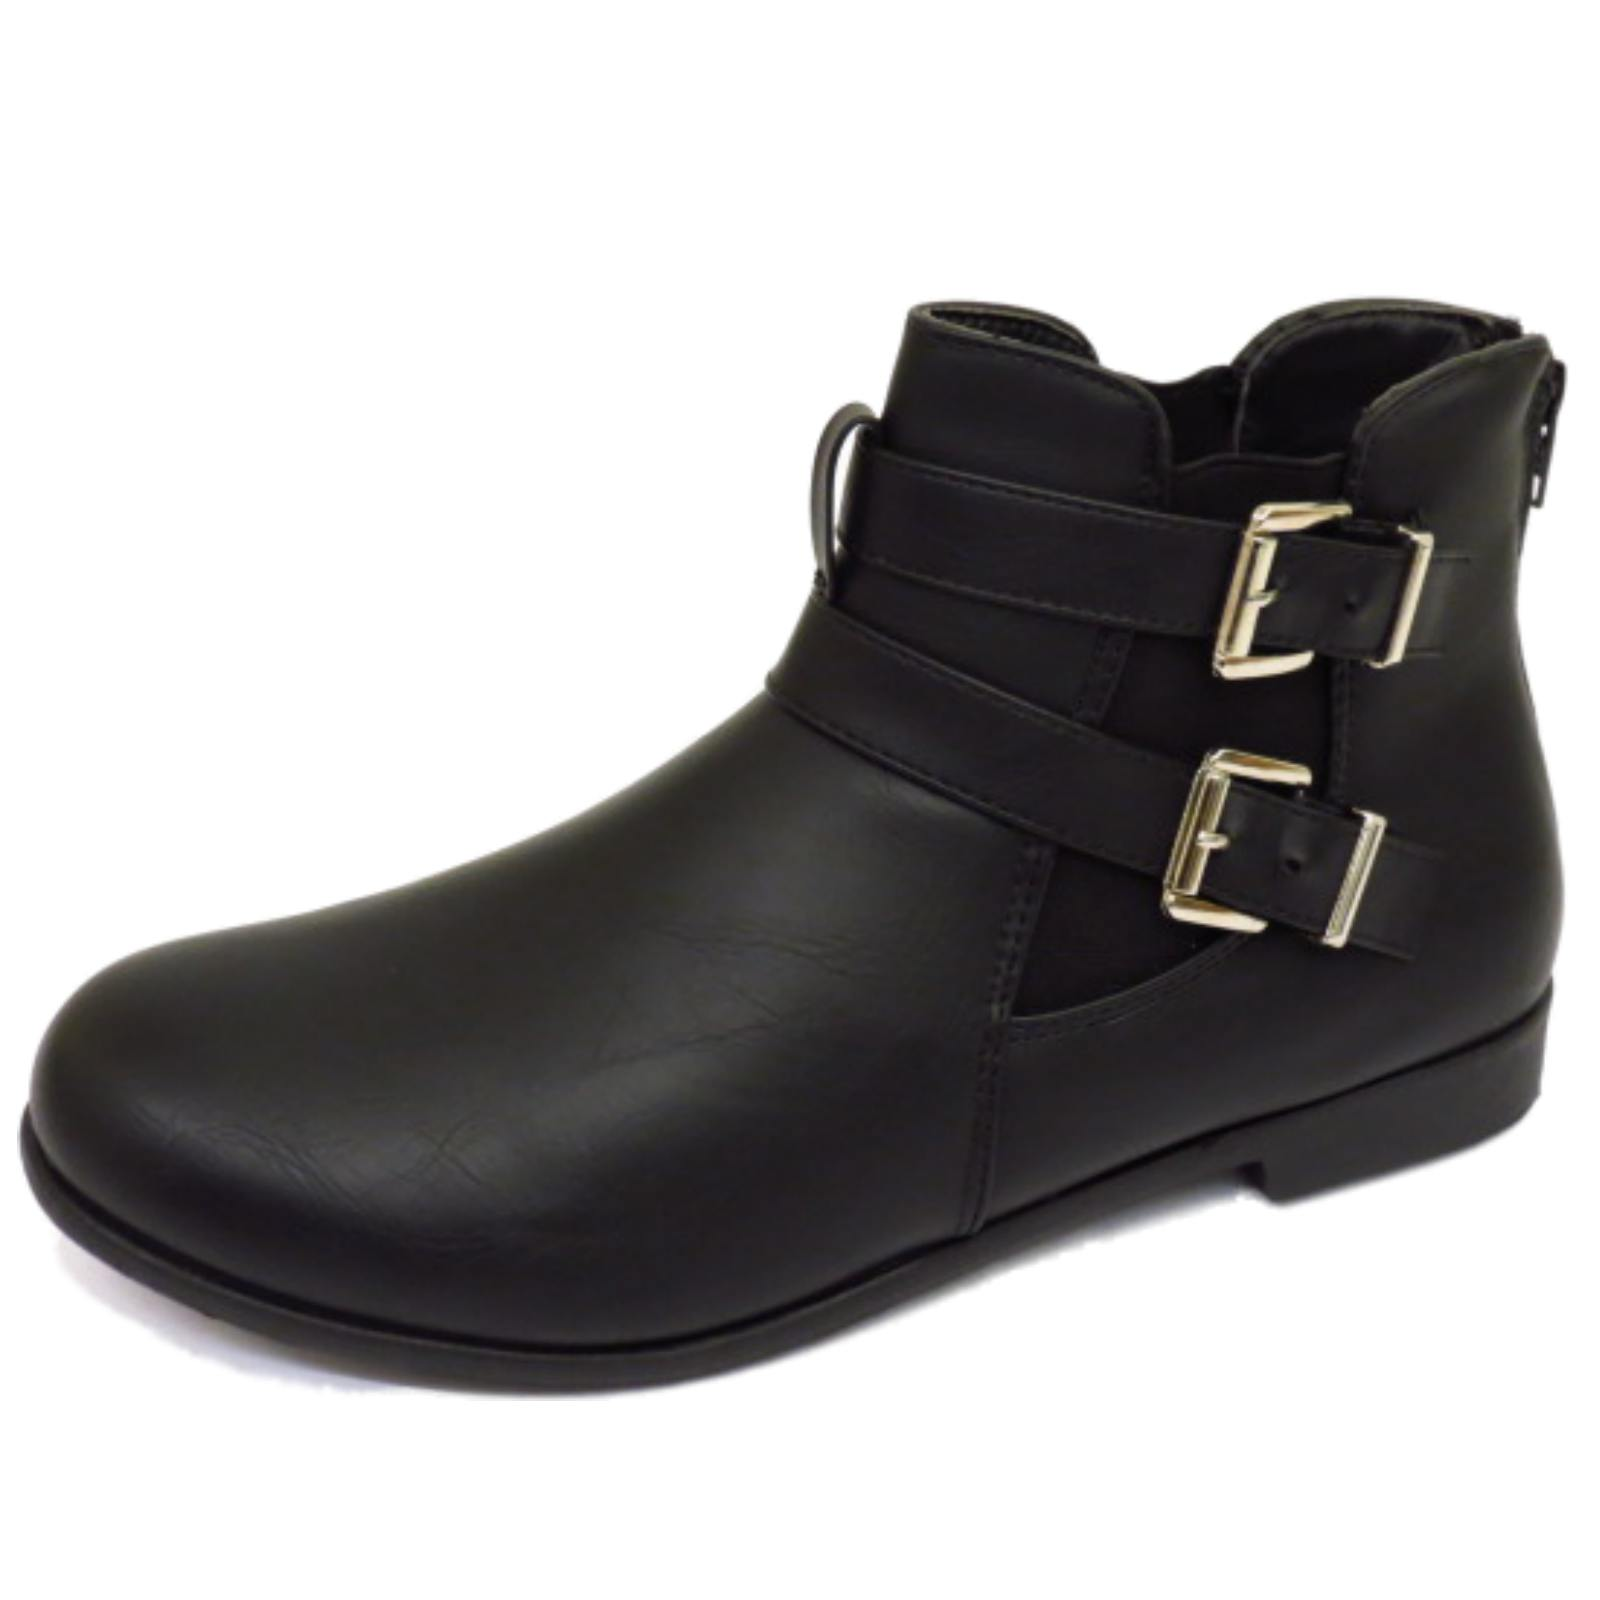 Details about WOMENS FLAT BLACK ZIP-UP CHELSEA BIKER SMART WORK COMFY ANKLE  BOOTS SHOES 3-9 0109199984